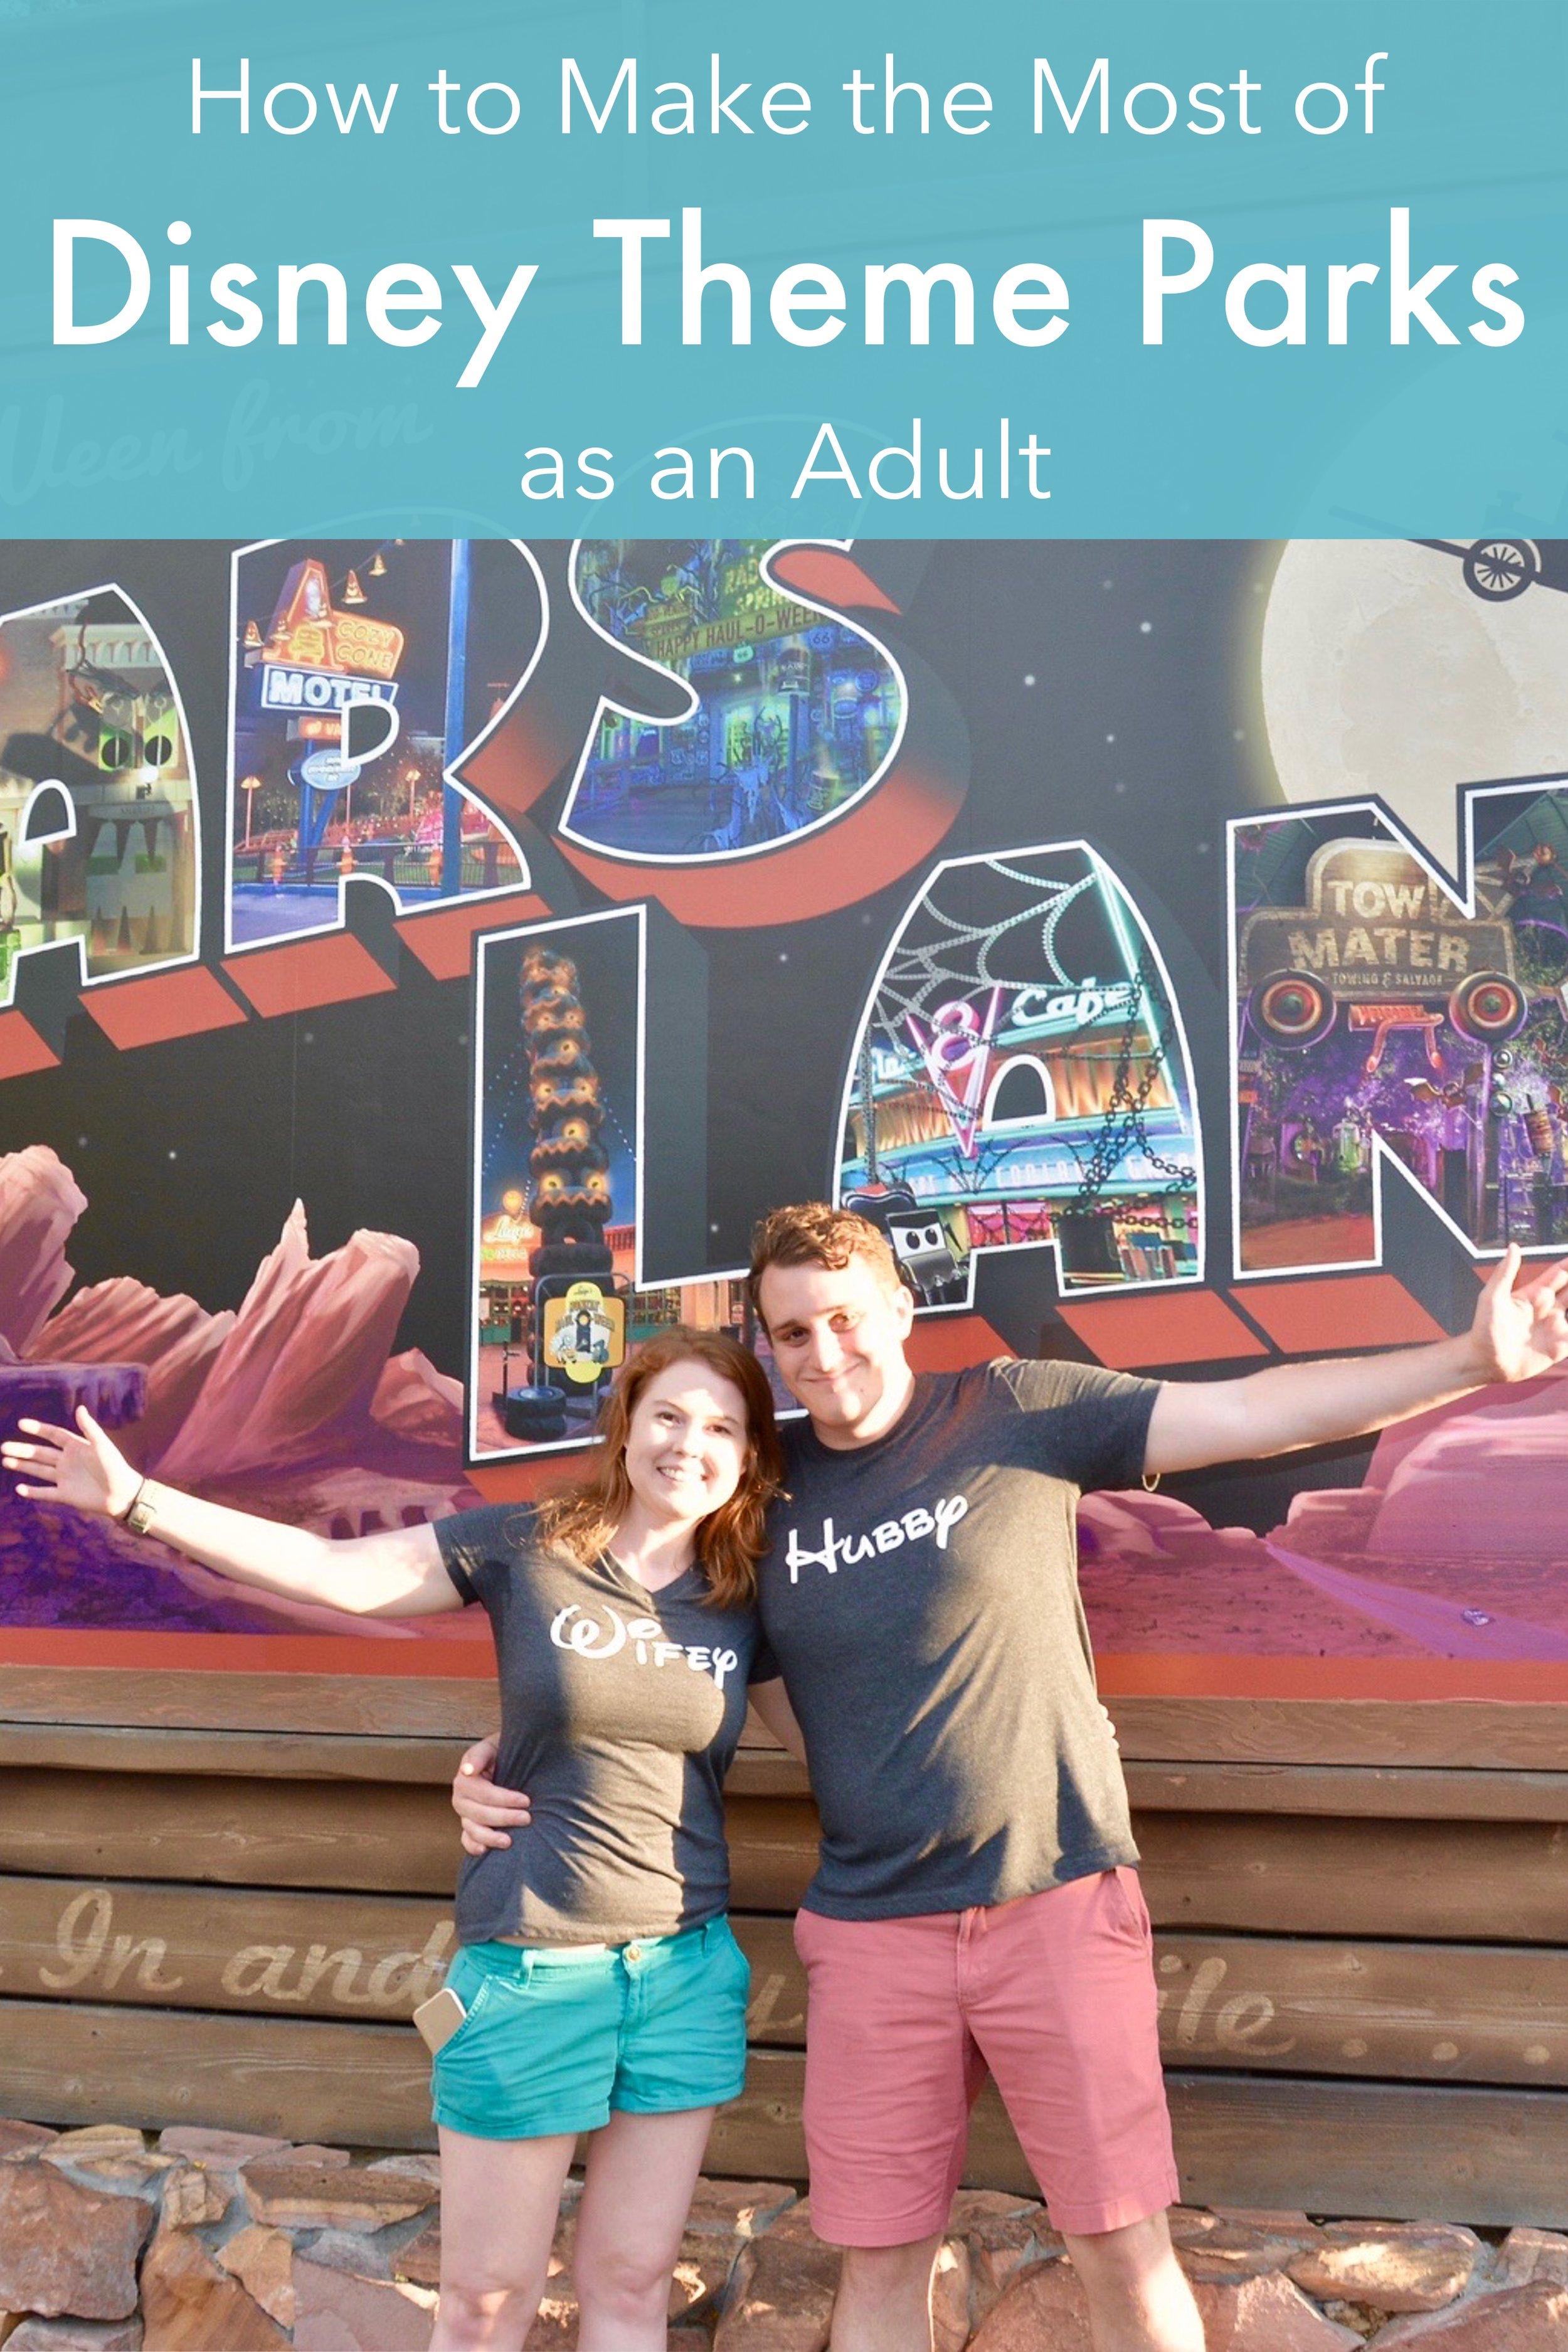 How to Make the Most of Disney Theme Parks as an Adult - A Happy Passport #disney #disneyworld #travel #vacation #florida #disneyland #Unitedstates #themepark